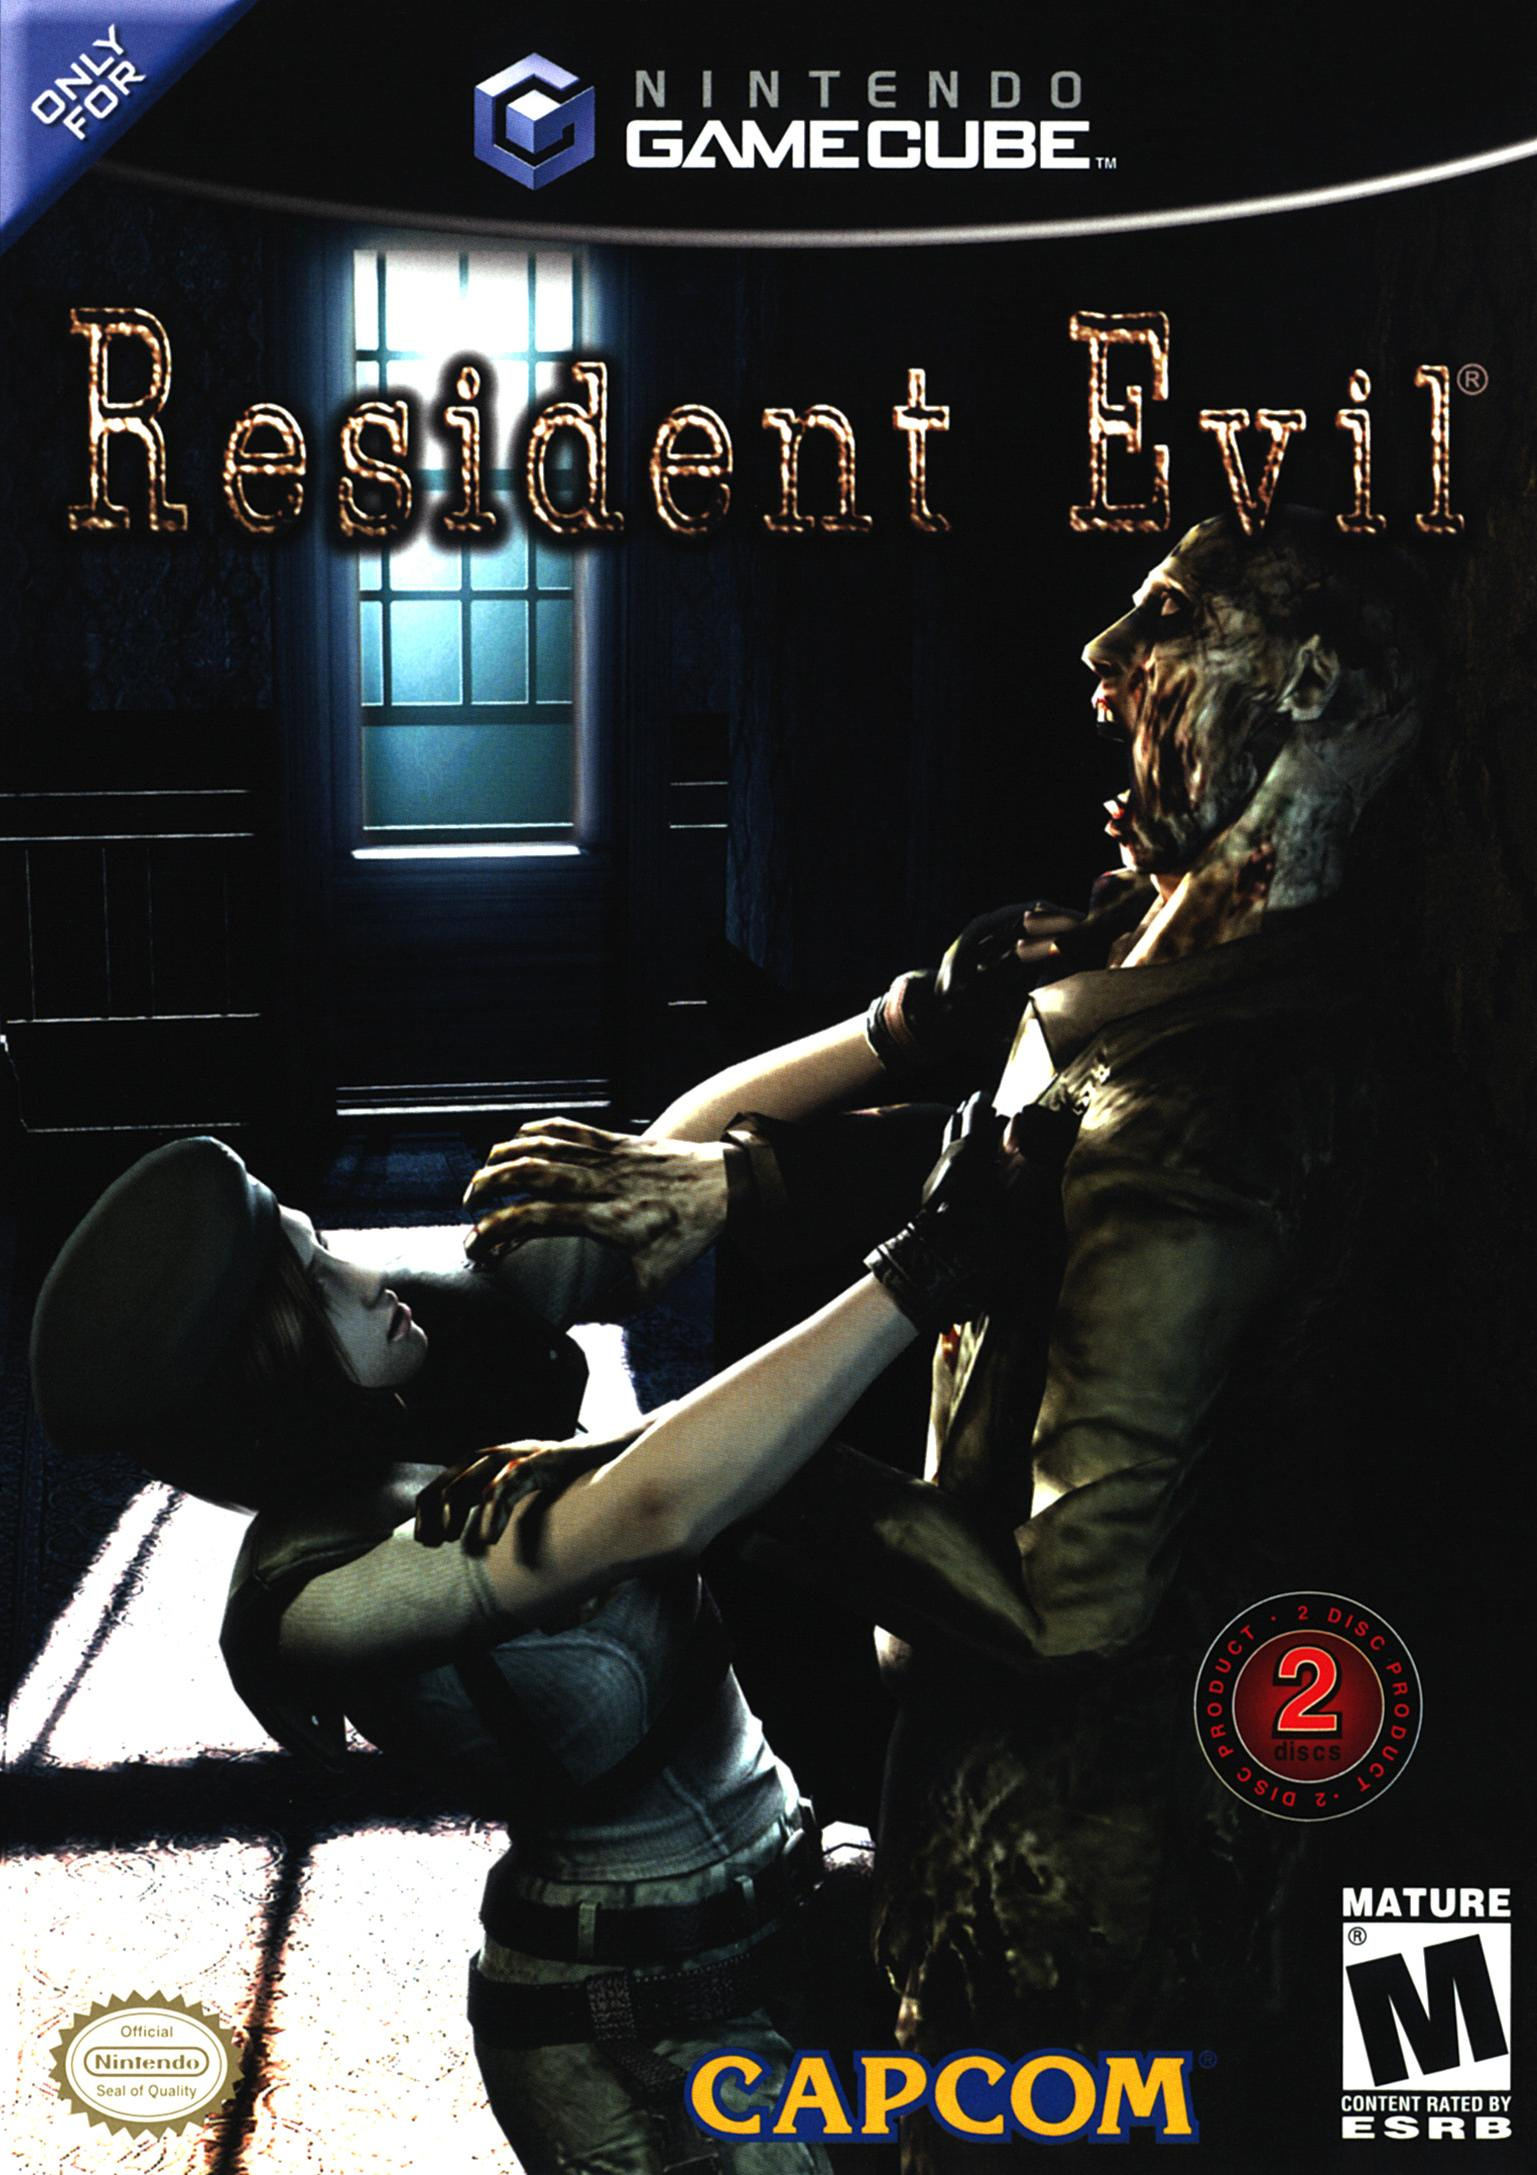 Ultimo juego ganado! - Página 12 Resident-evil-cover